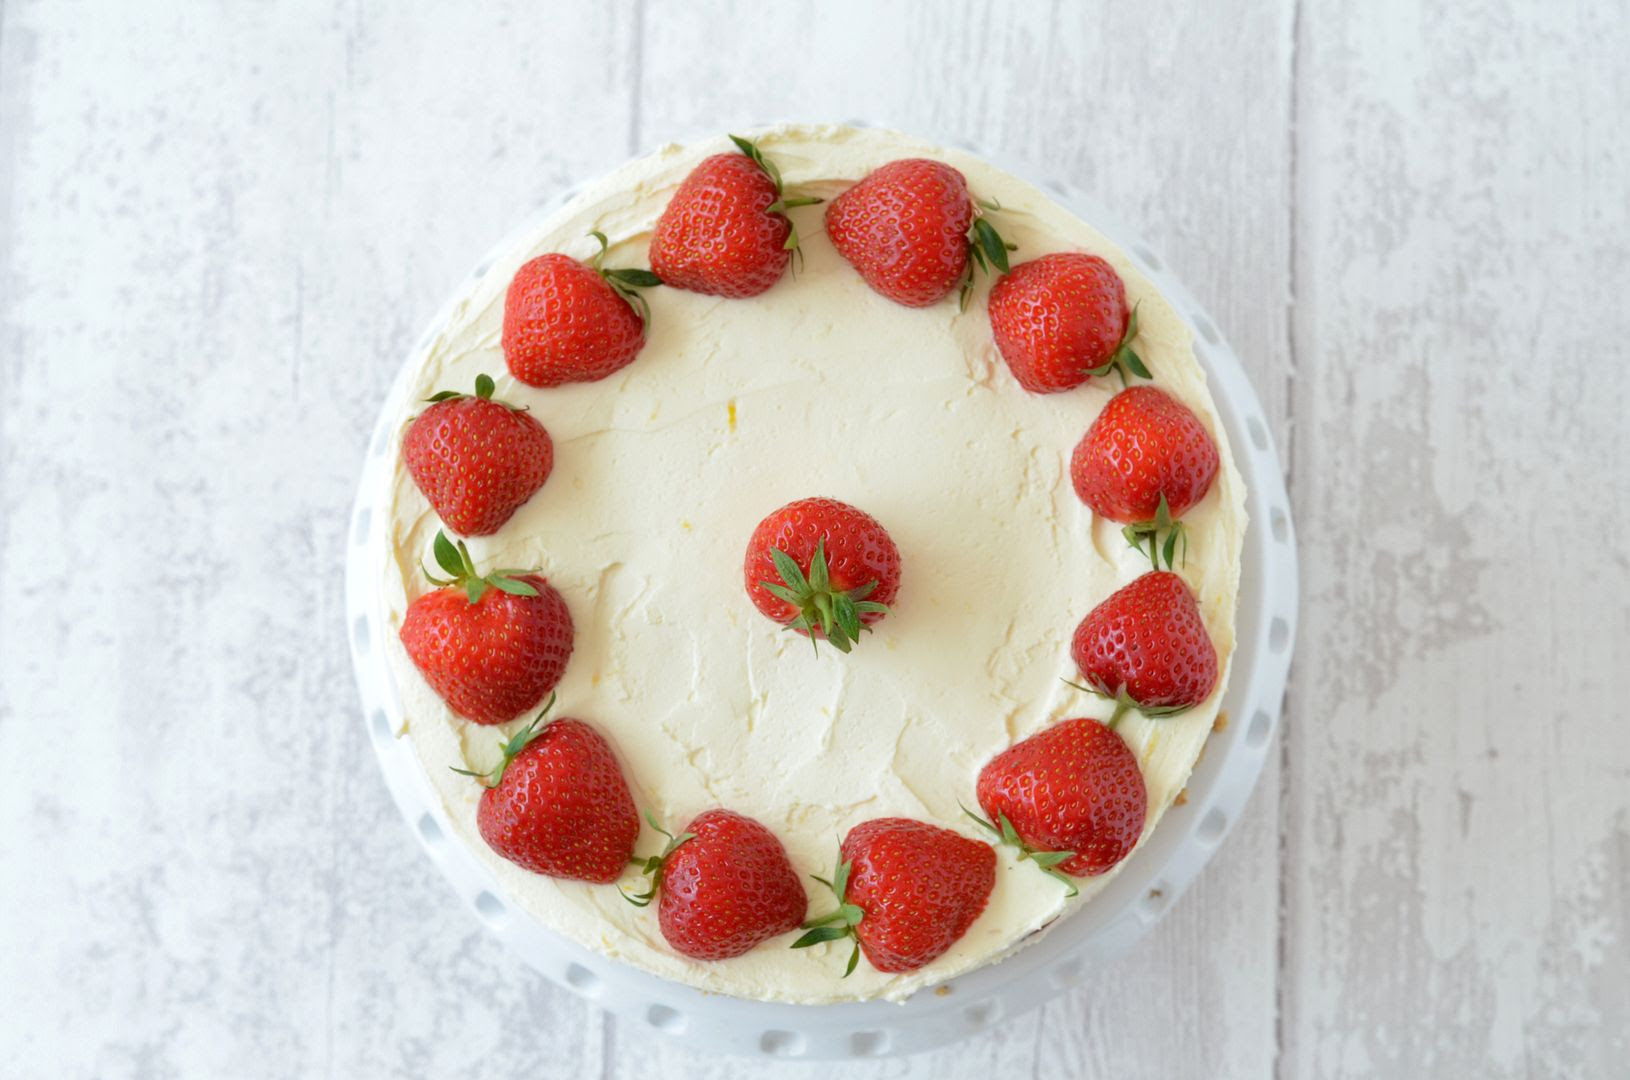 Strawberry and Lemon Cheesecake